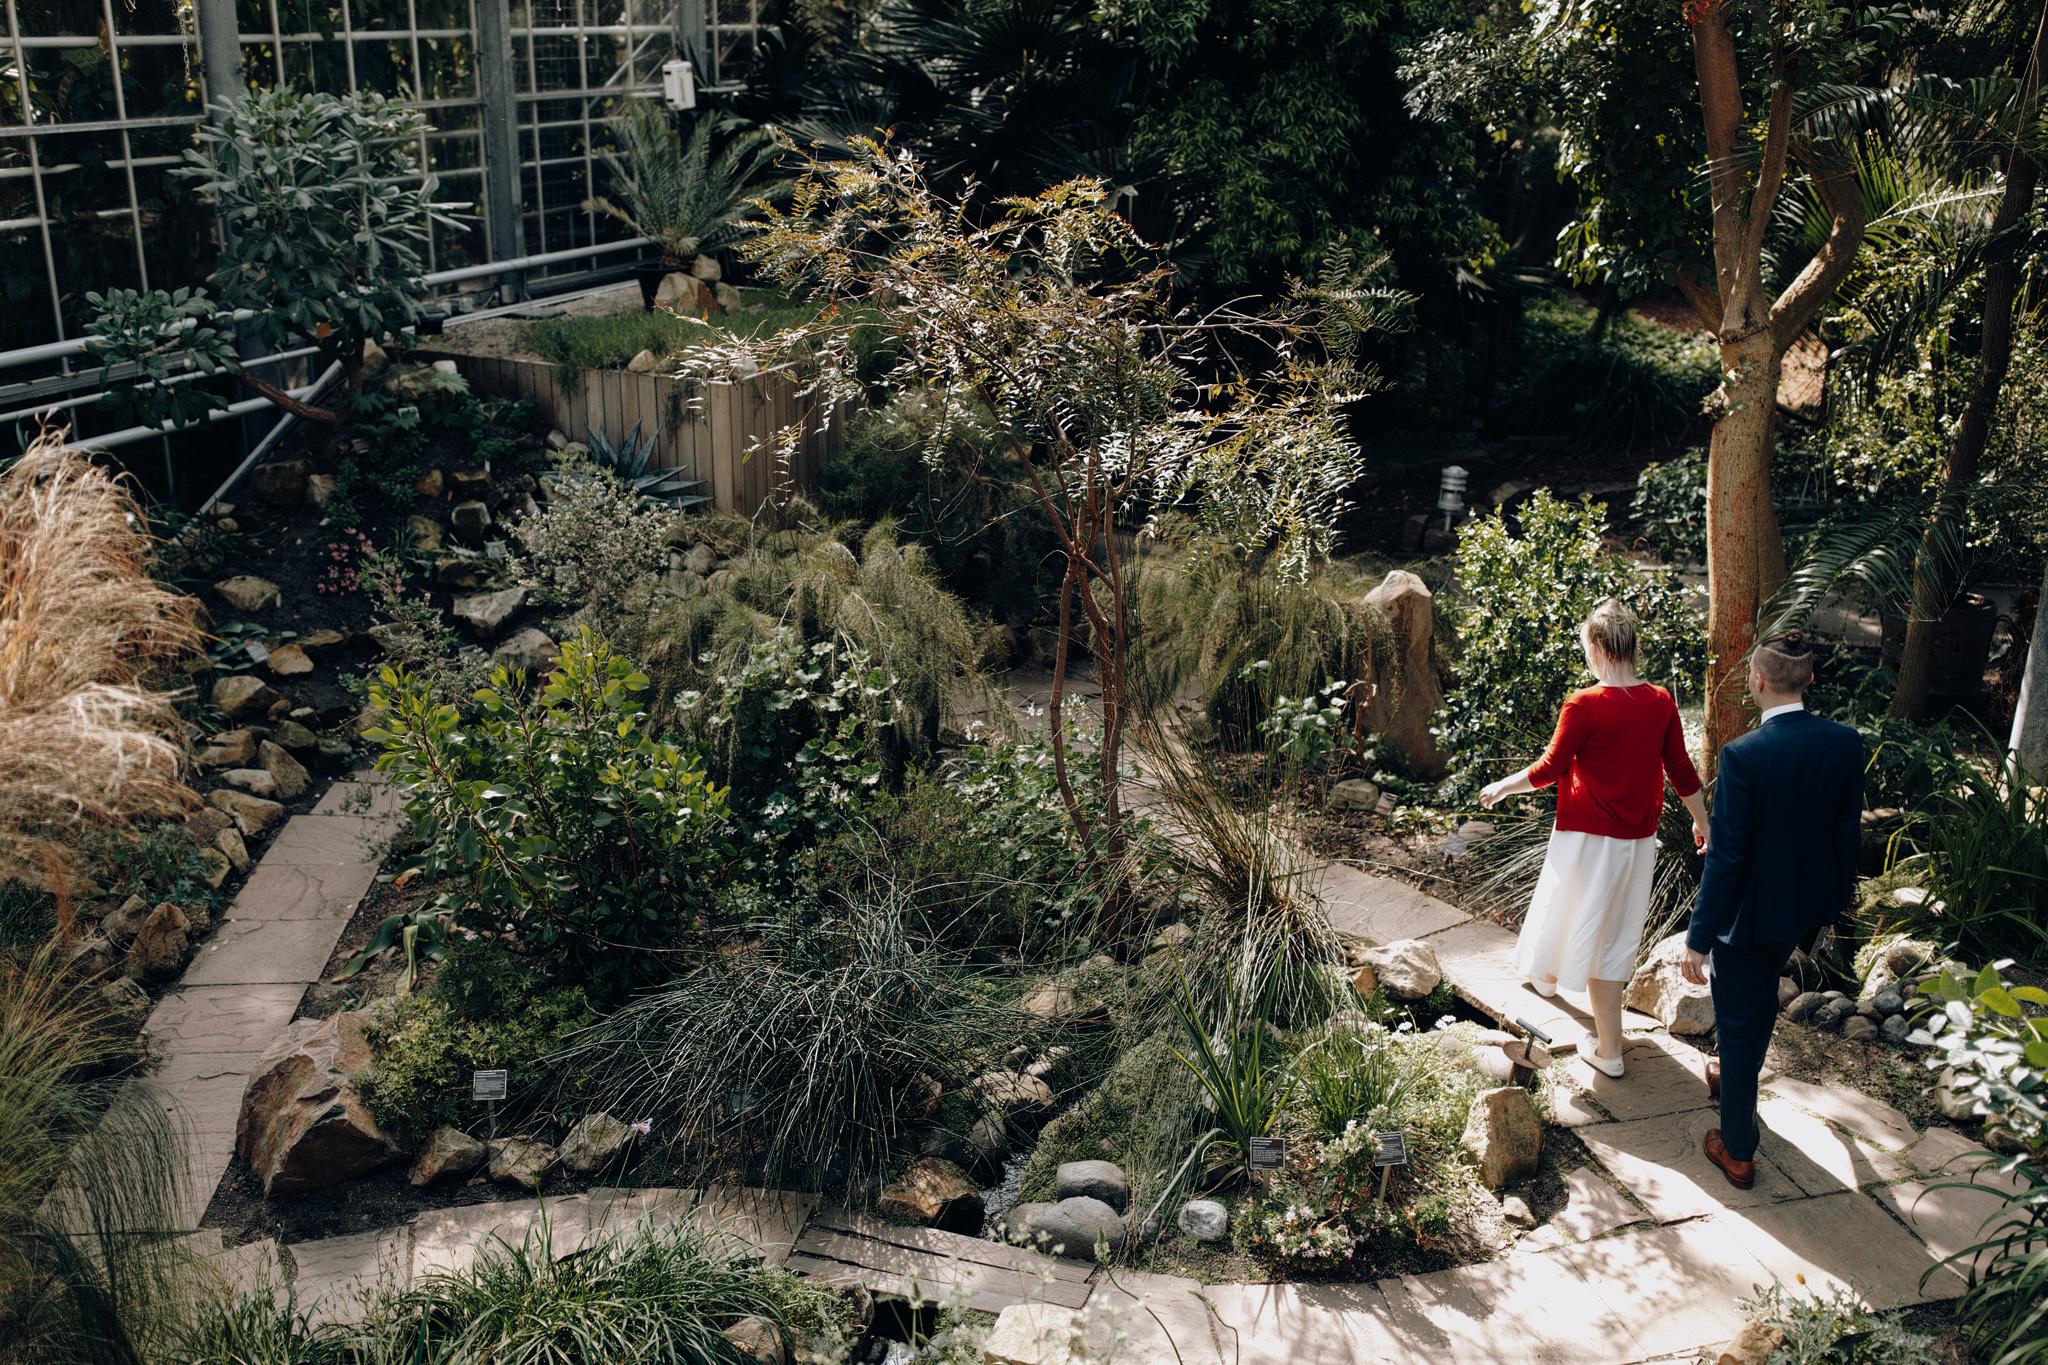 Elopement couple wandering in Hortus Botanicus Amsterdam